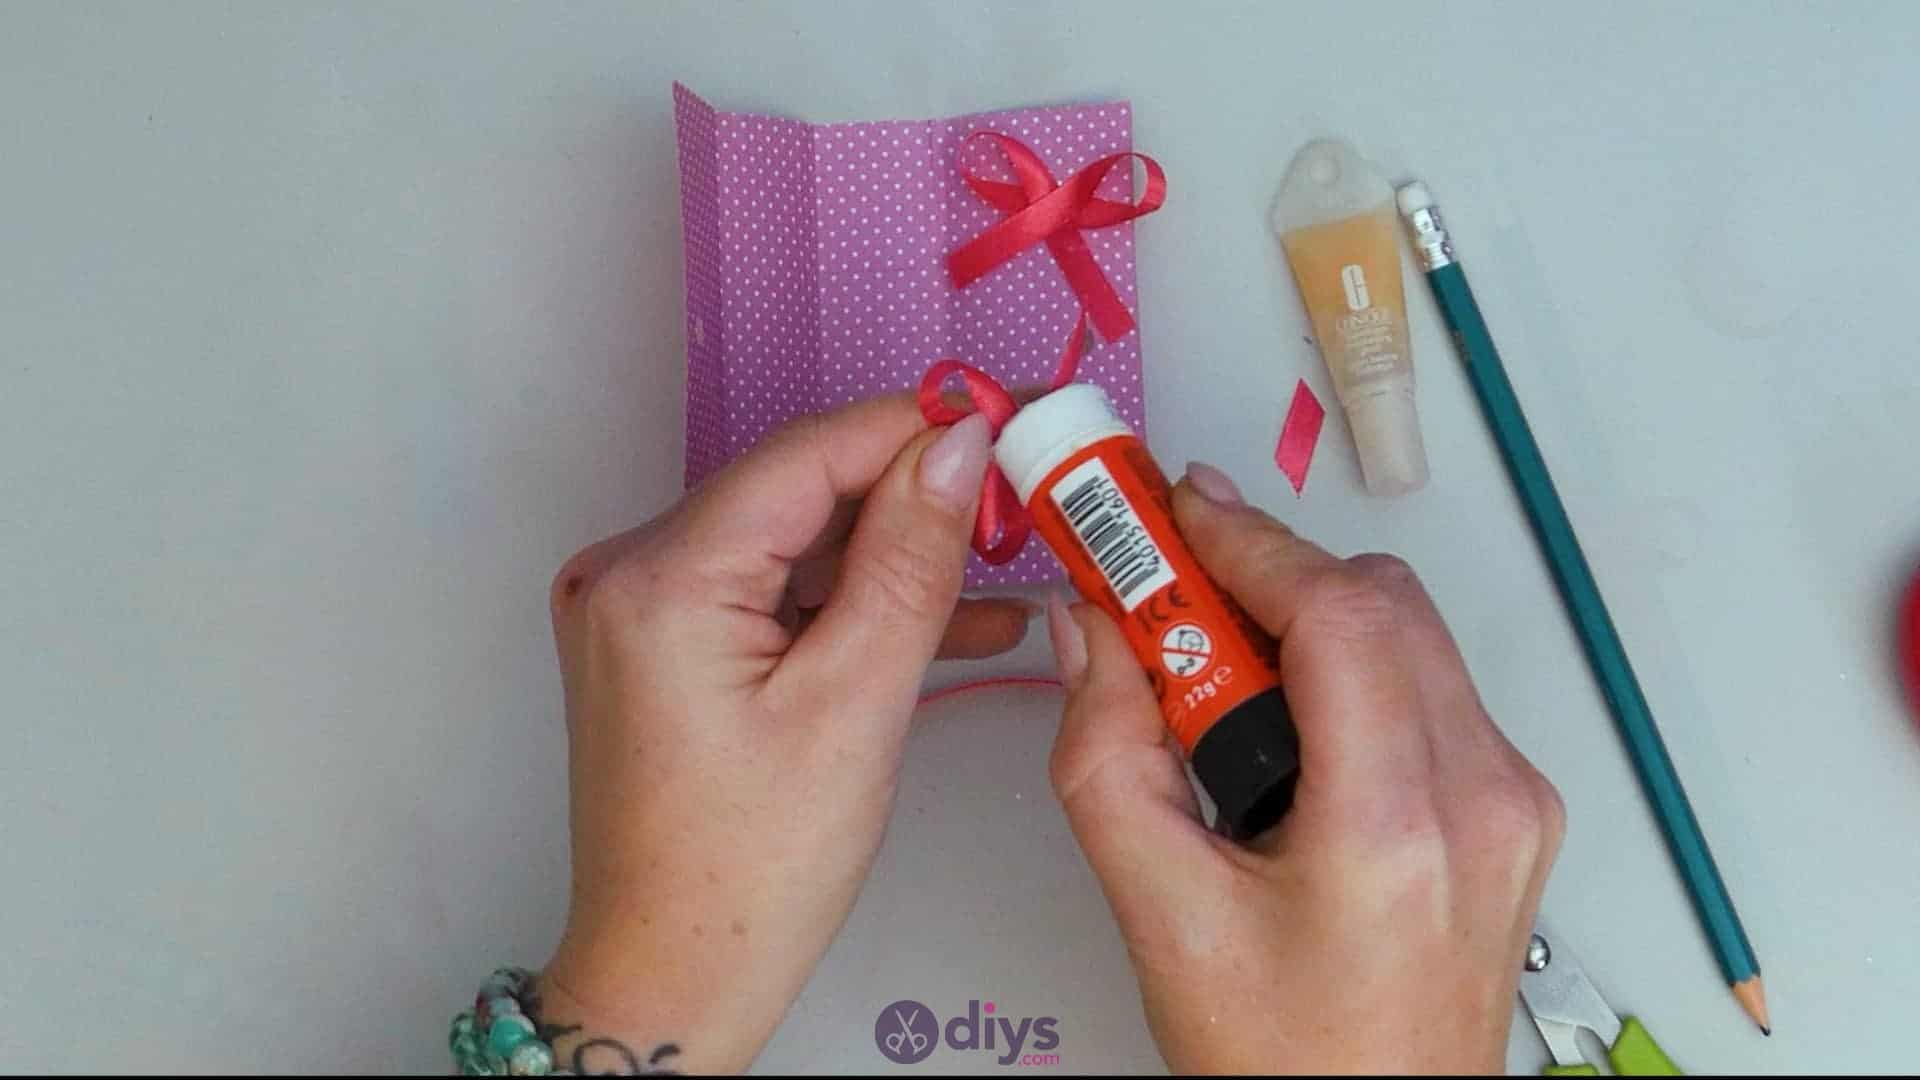 Diy lipstick gift card step 10